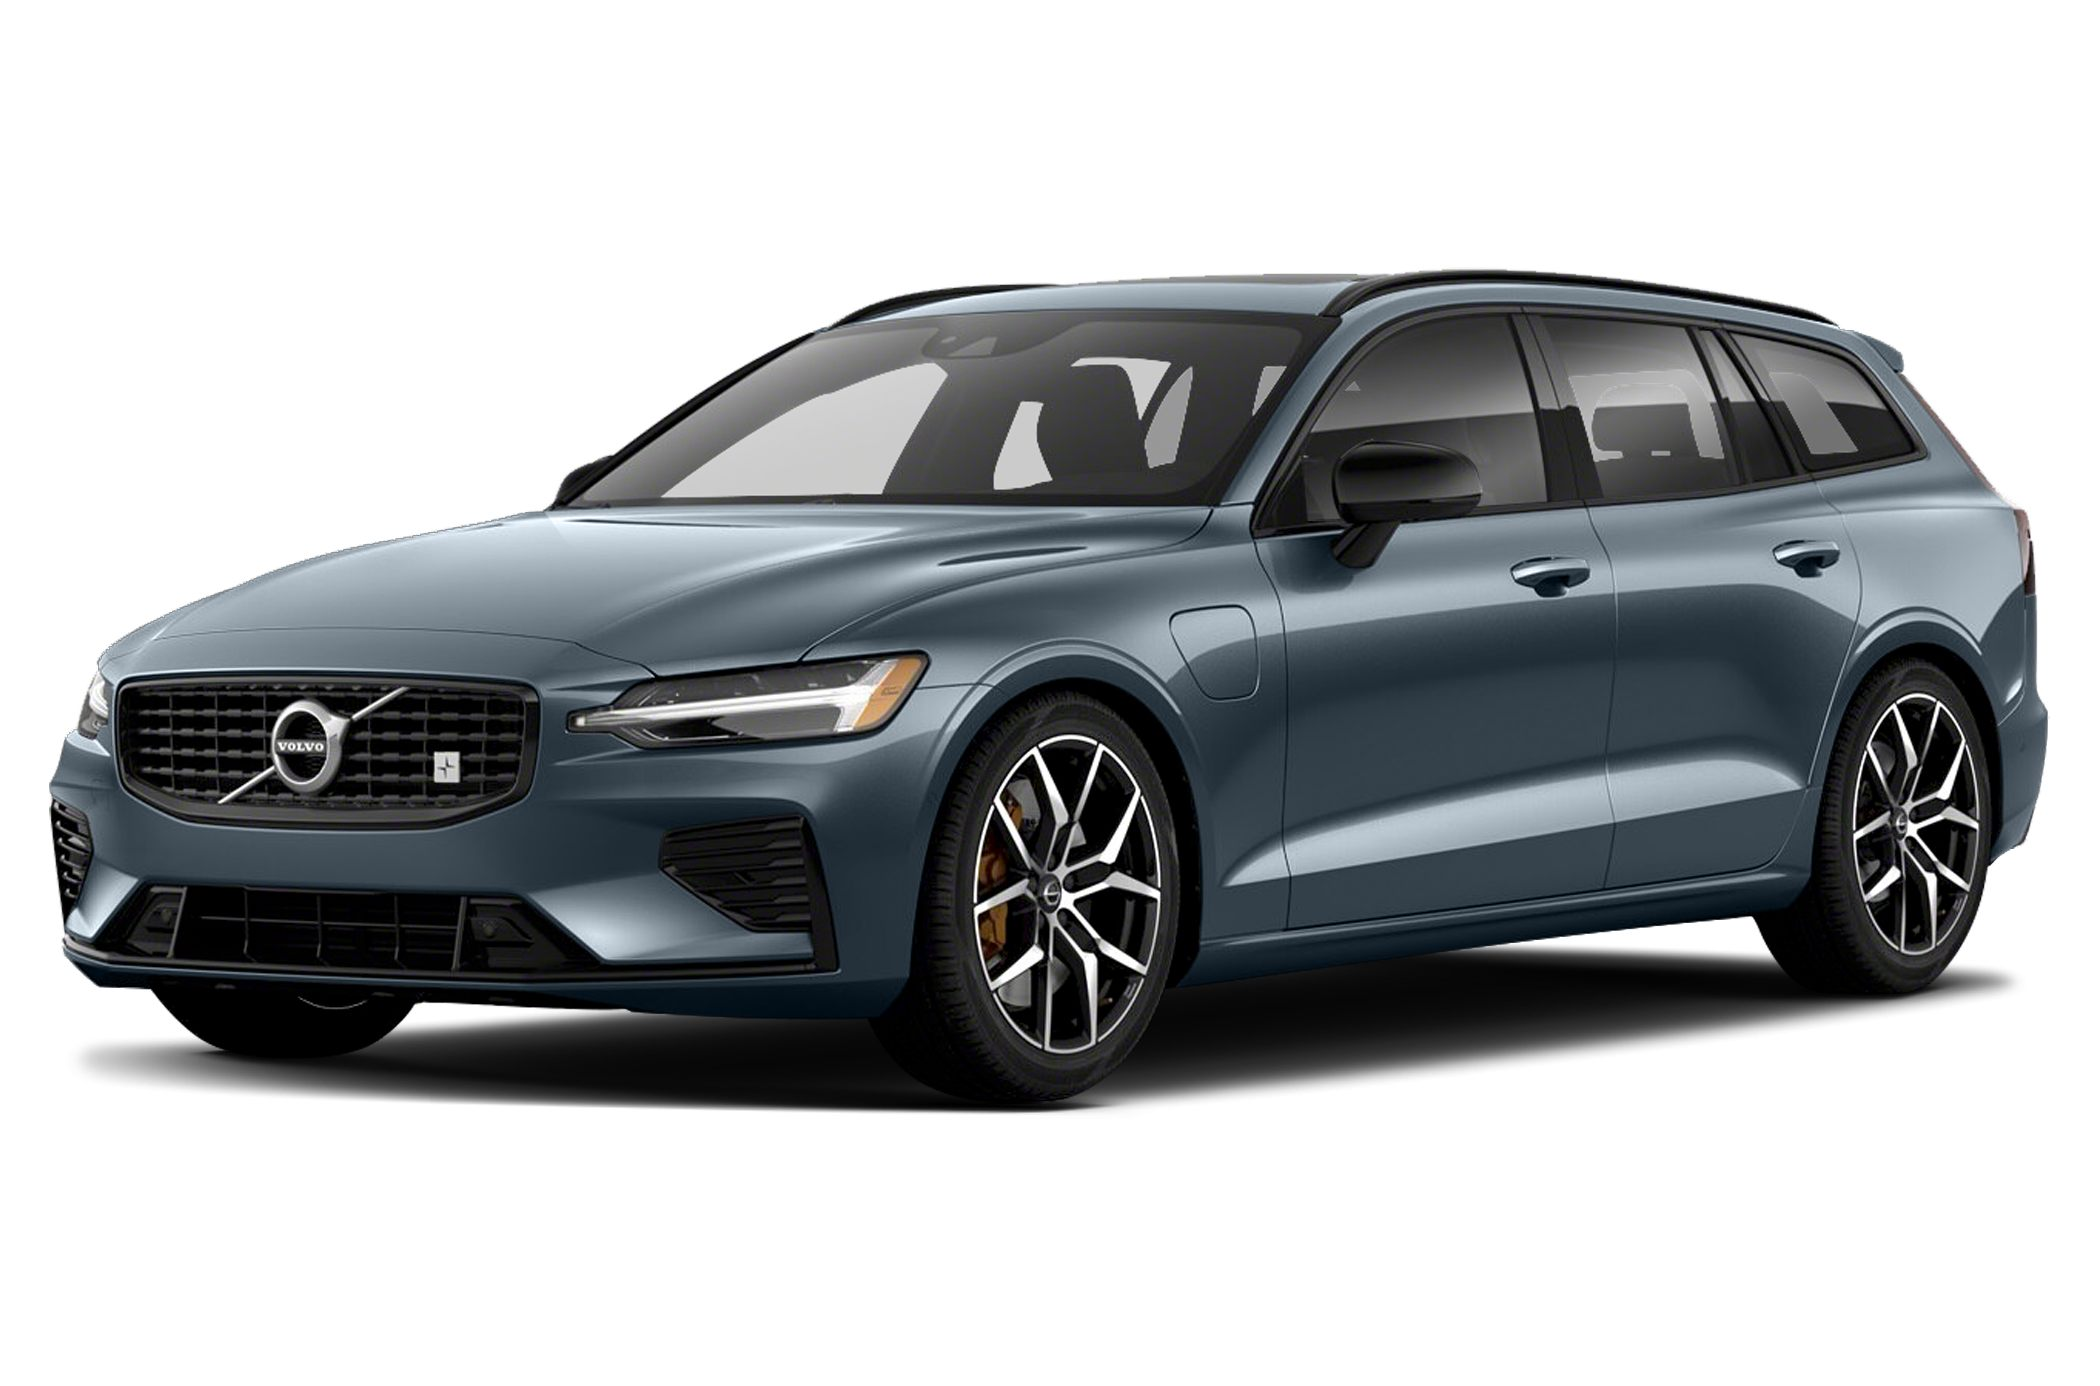 2020 Volvo V60 Hybrid T8 Polestar 4dr All Wheel Drive Wagon Specs And Prices